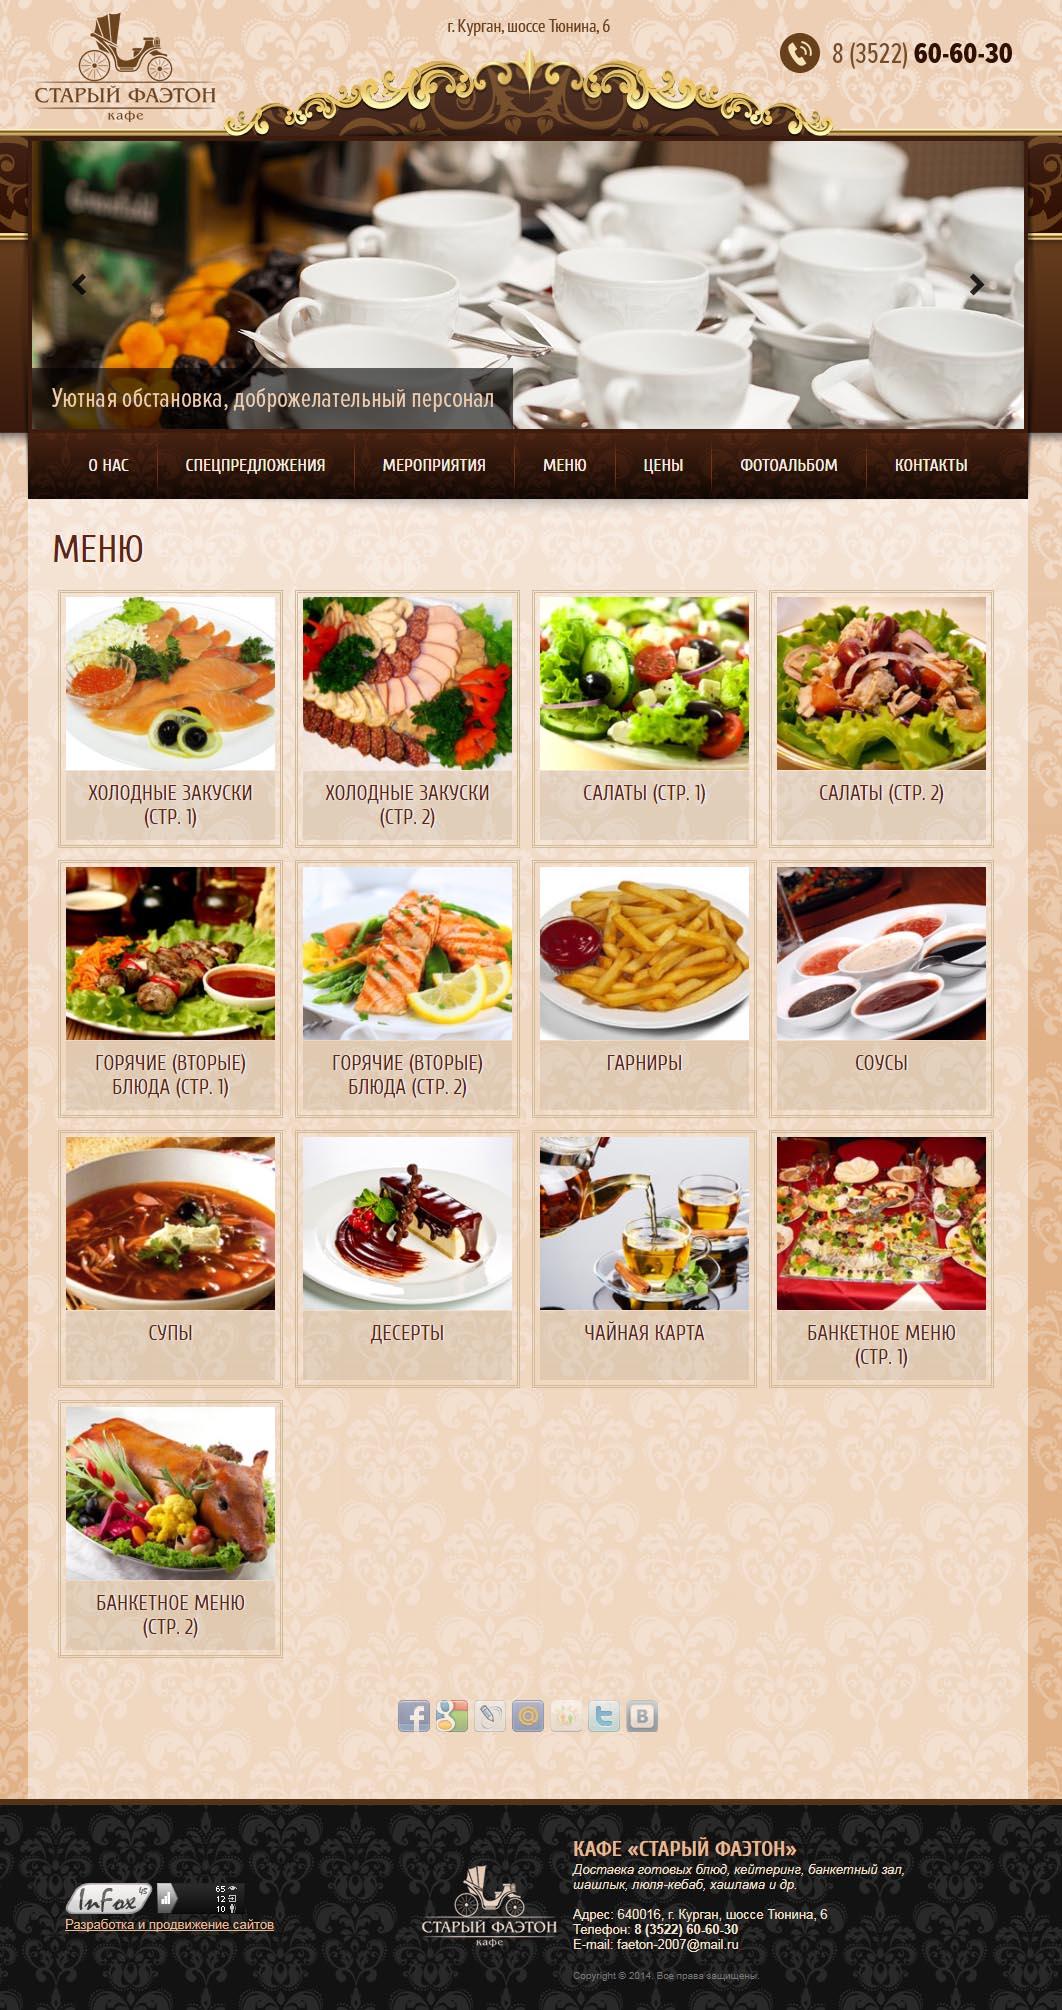 Пример сайта кафе-ресторана